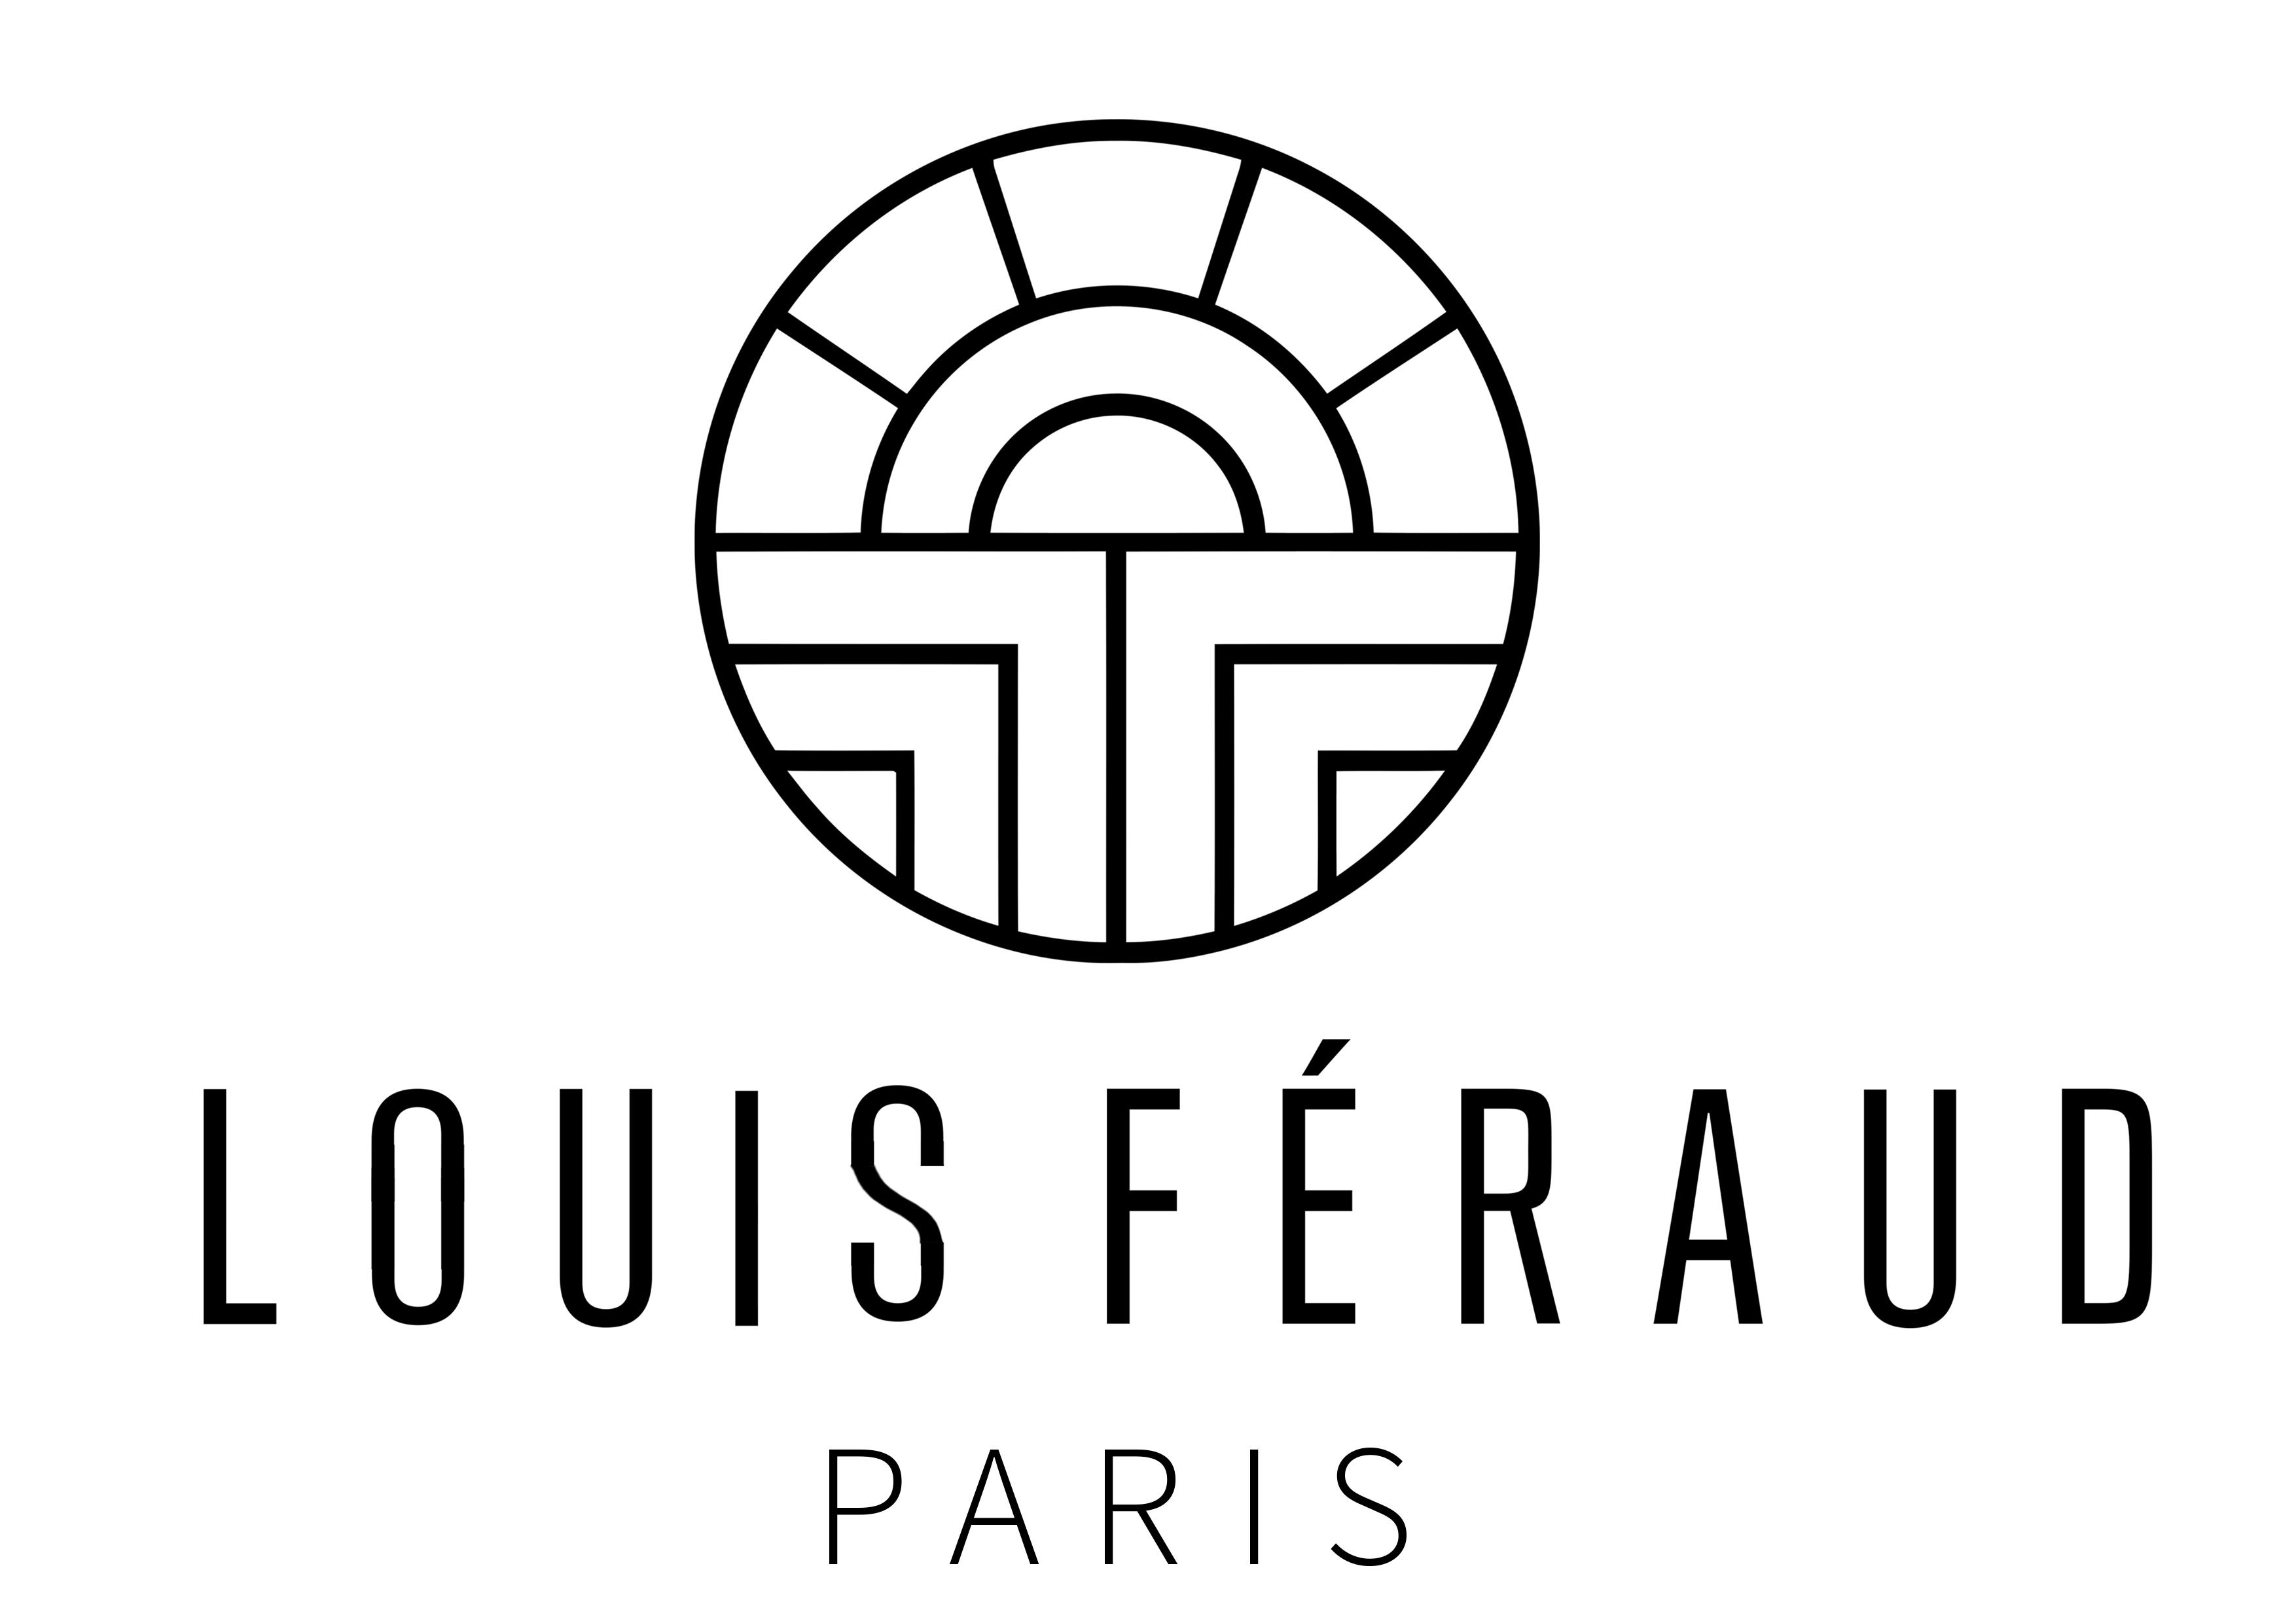 لويس فيرود Louis Feraud